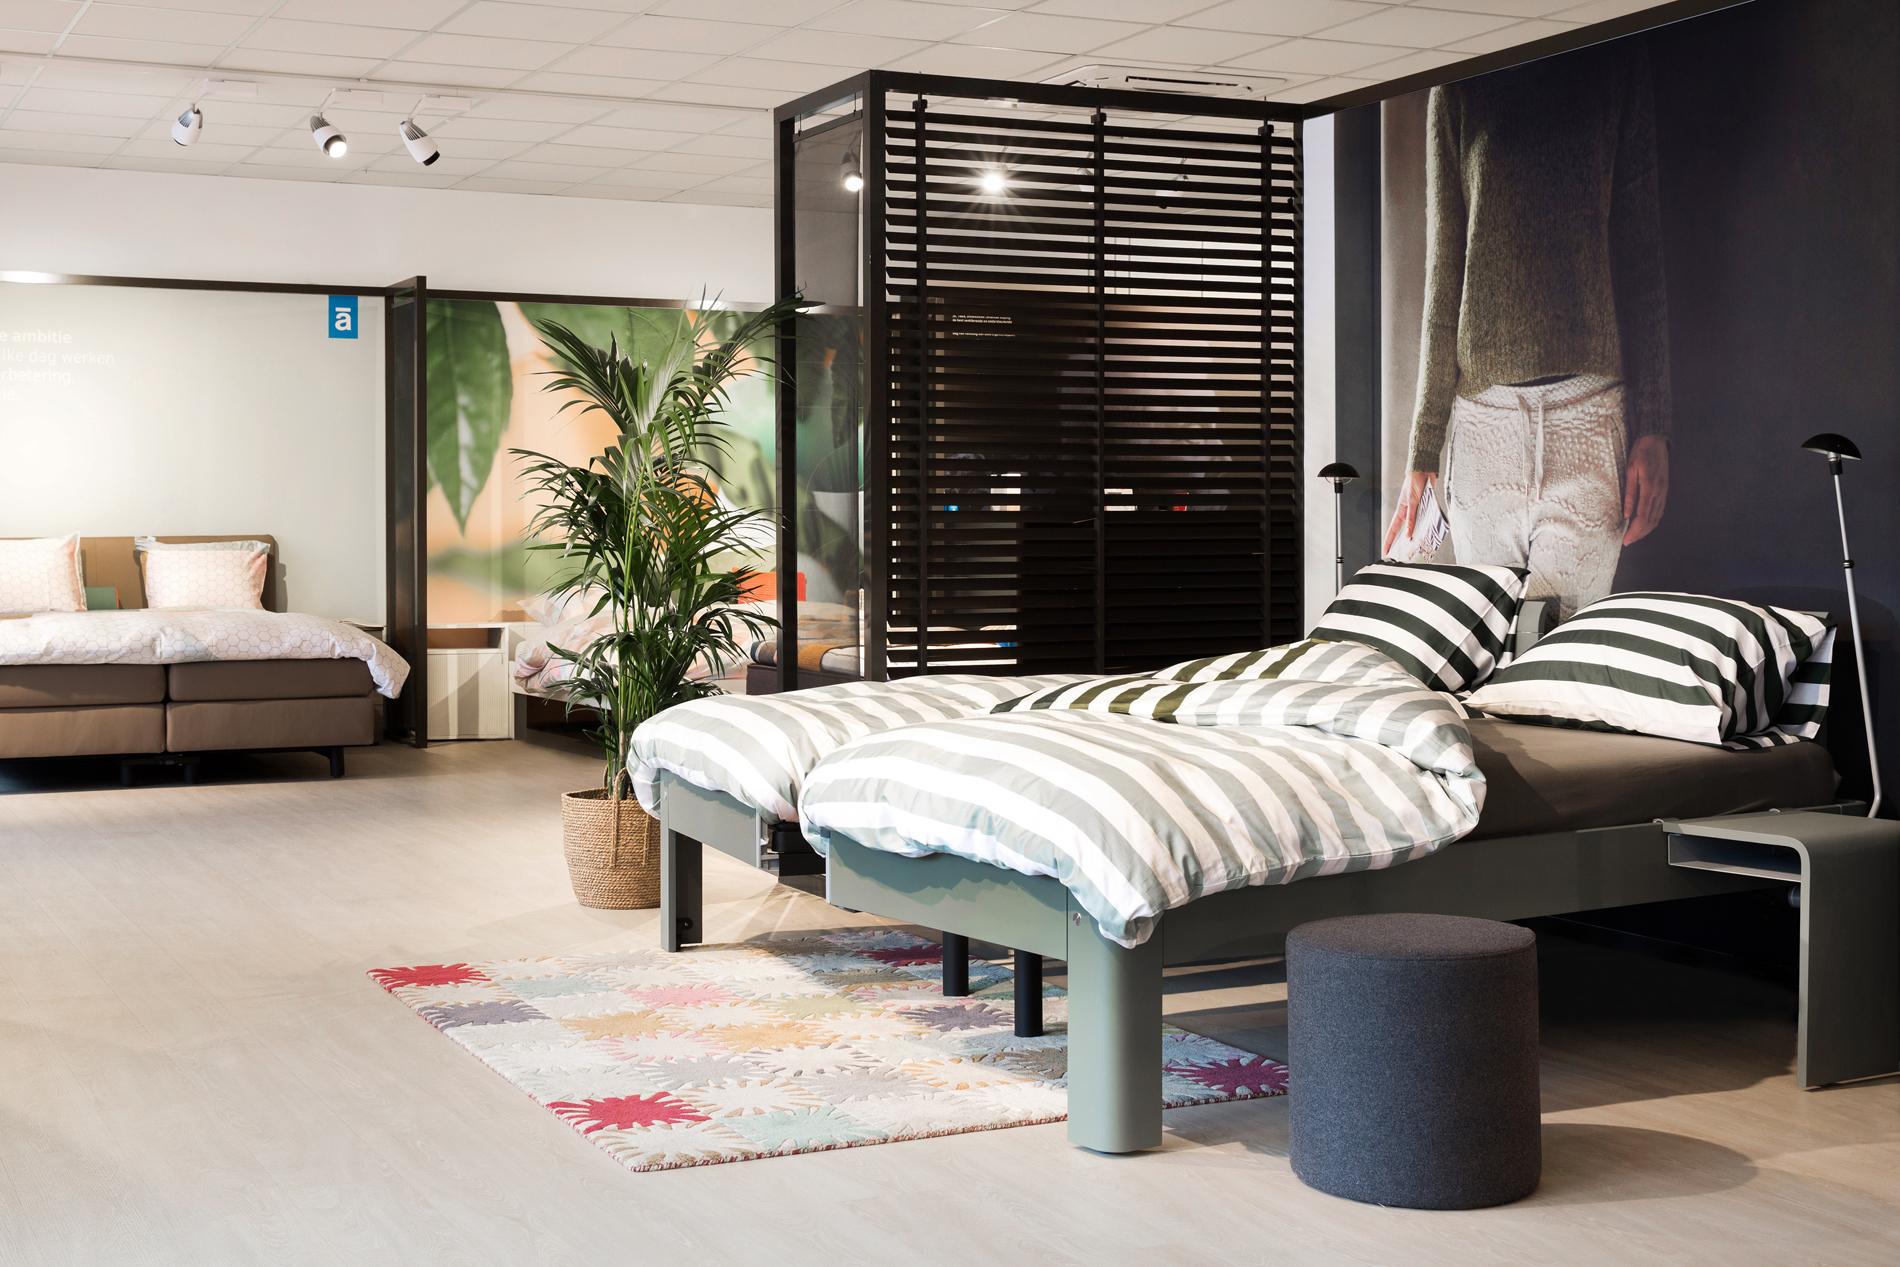 Auping Plaza Amersfoort – Natural Vita Talalay Latex Mattress Store in Amersfoort Utrecht